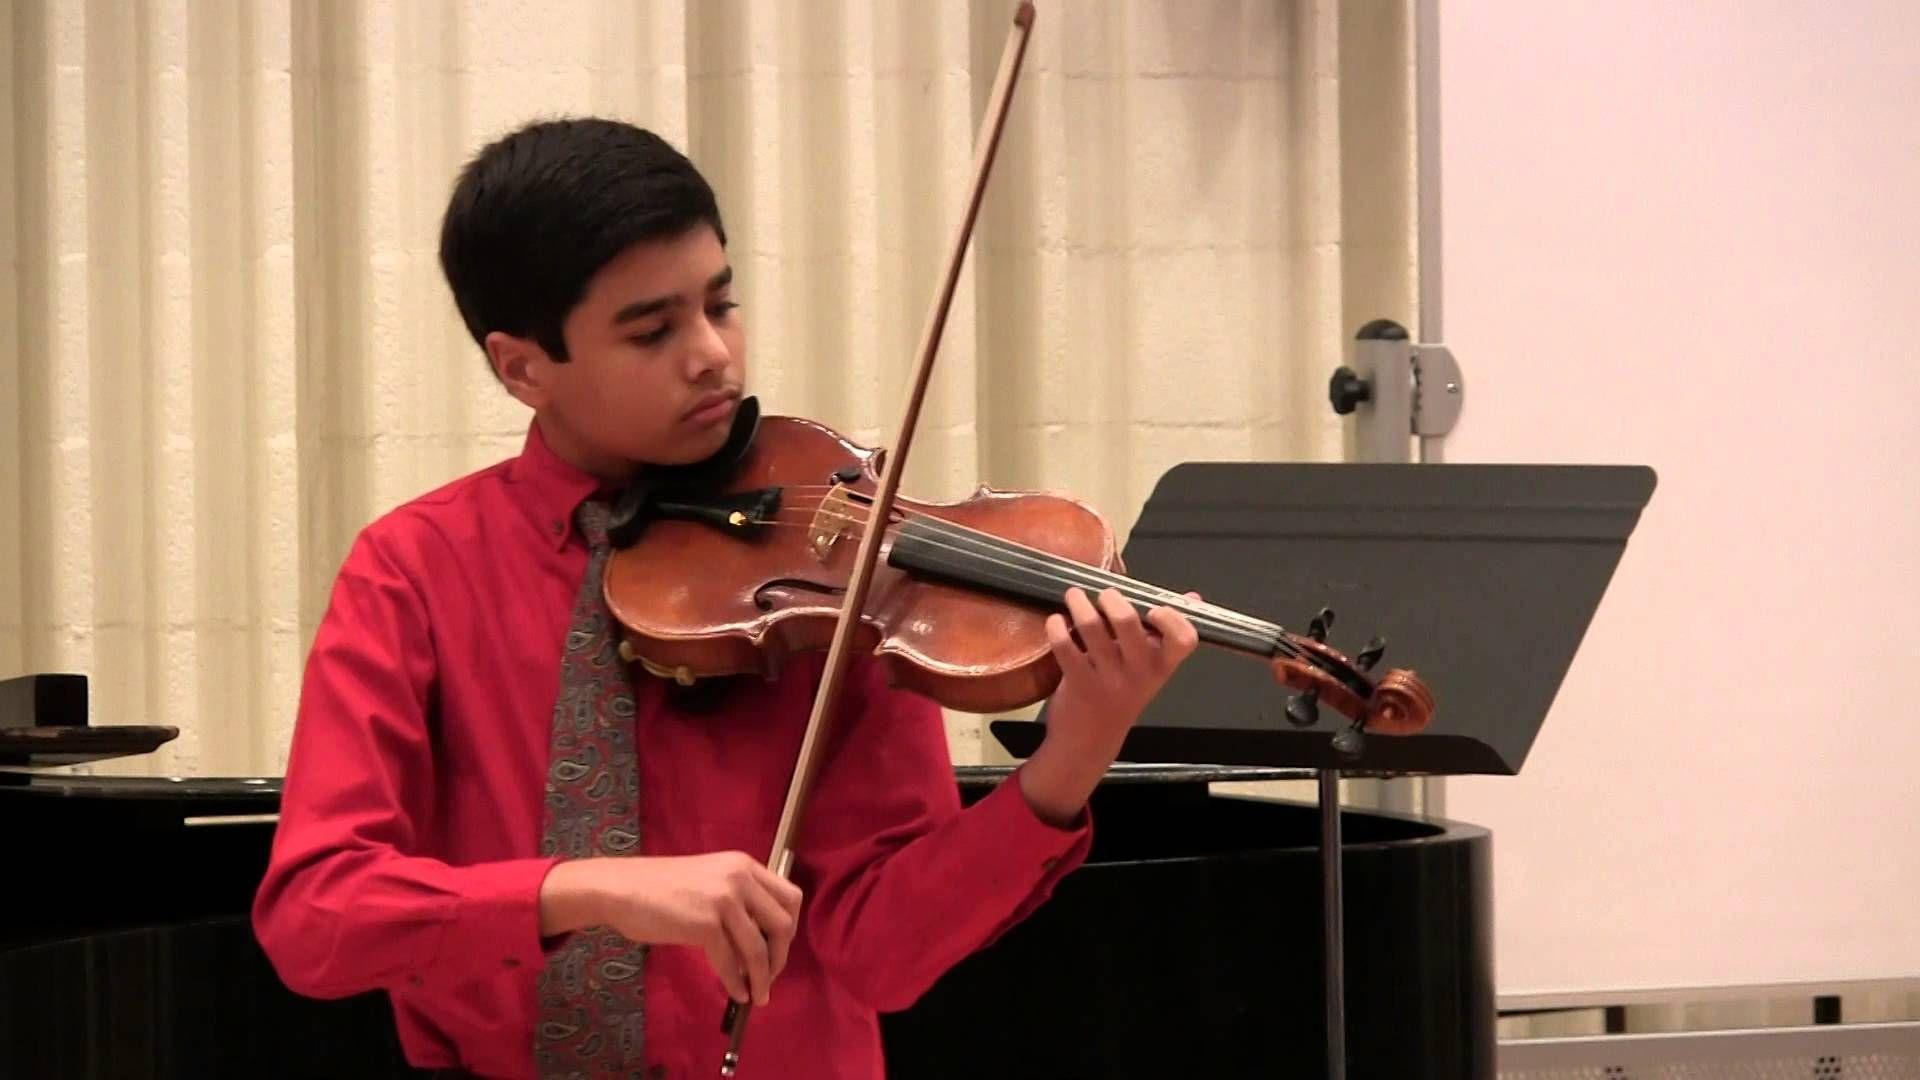 Symphonie Espagnole mvmt 5 - Shomya Mitra